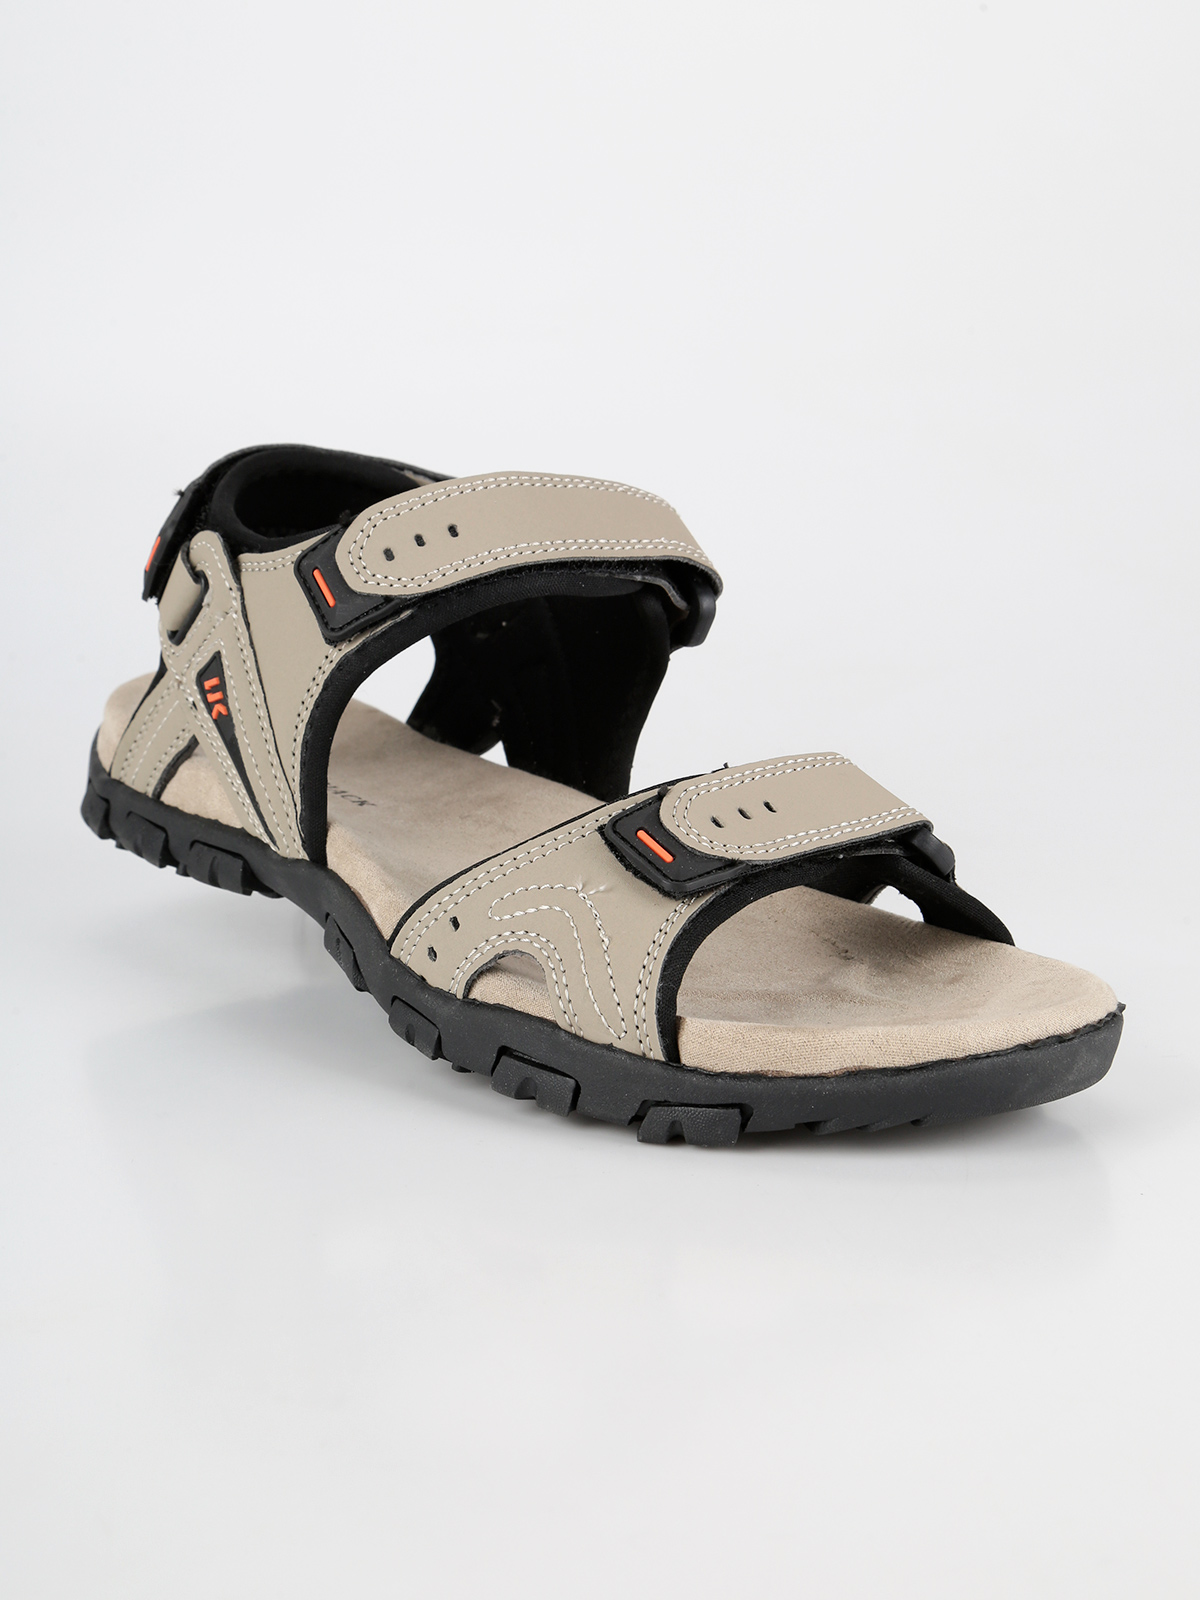 LUMBERJACK Spring Summer man's casual Fahion cosy beige man's sandal sandal